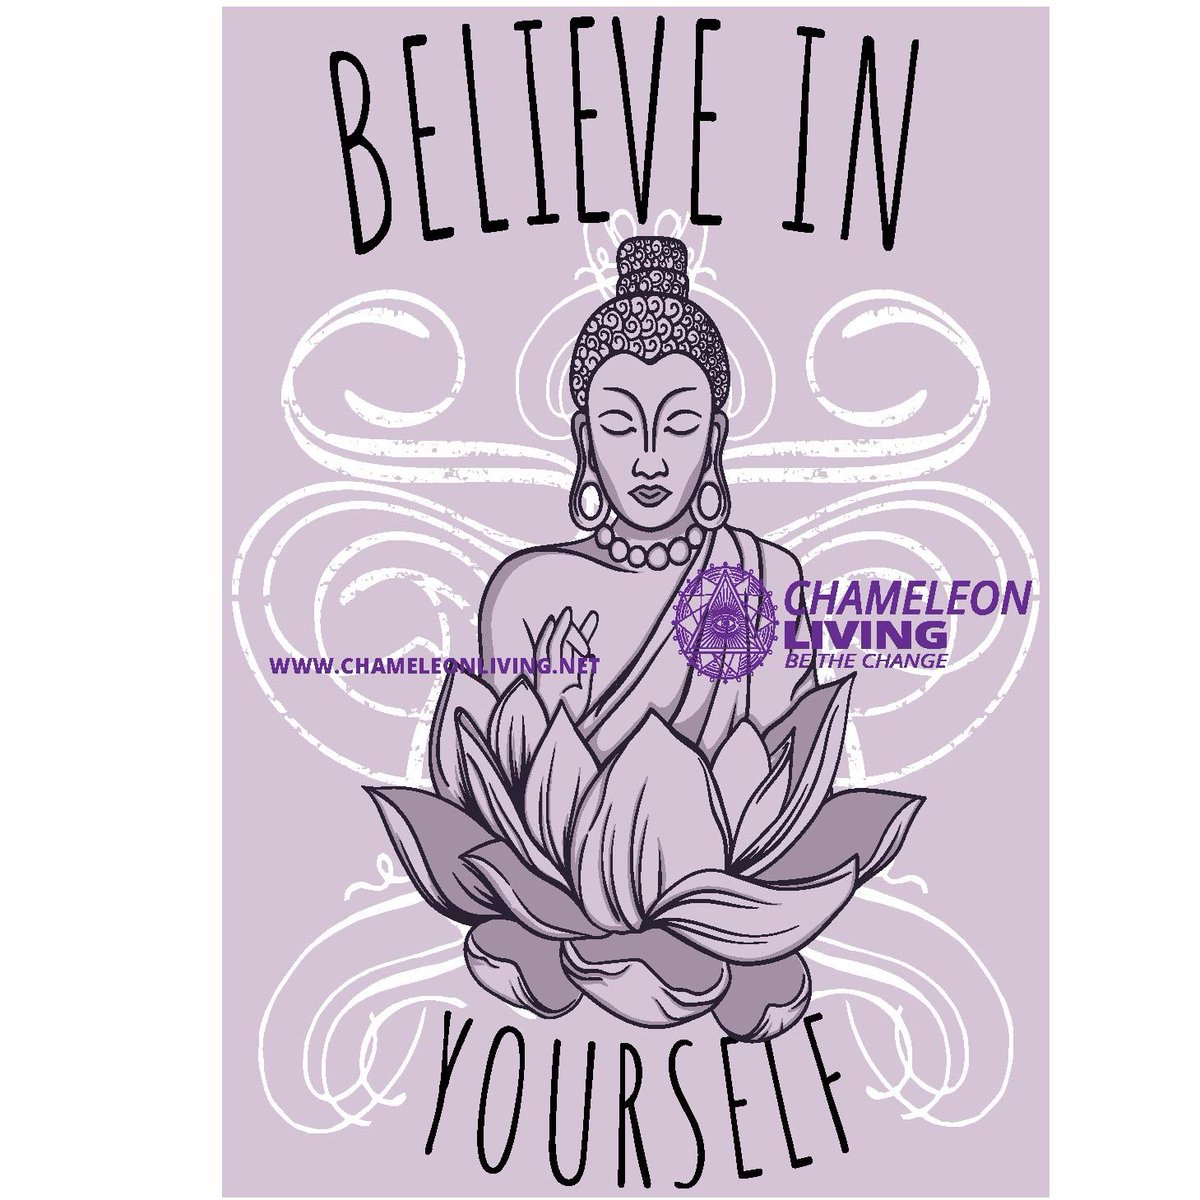 Believe in Yourself   #believeinyourself #beliefinyourselfalways #everythingispossible #truetoyourself #keepstriving #bebrave #BePositive #nothingisimpossible #believeinyou #beyourself #havefaithinyourself #positivemindset #YogaForAll #meditationspace #Meditationpic.twitter.com/gUCAY5C1Ti